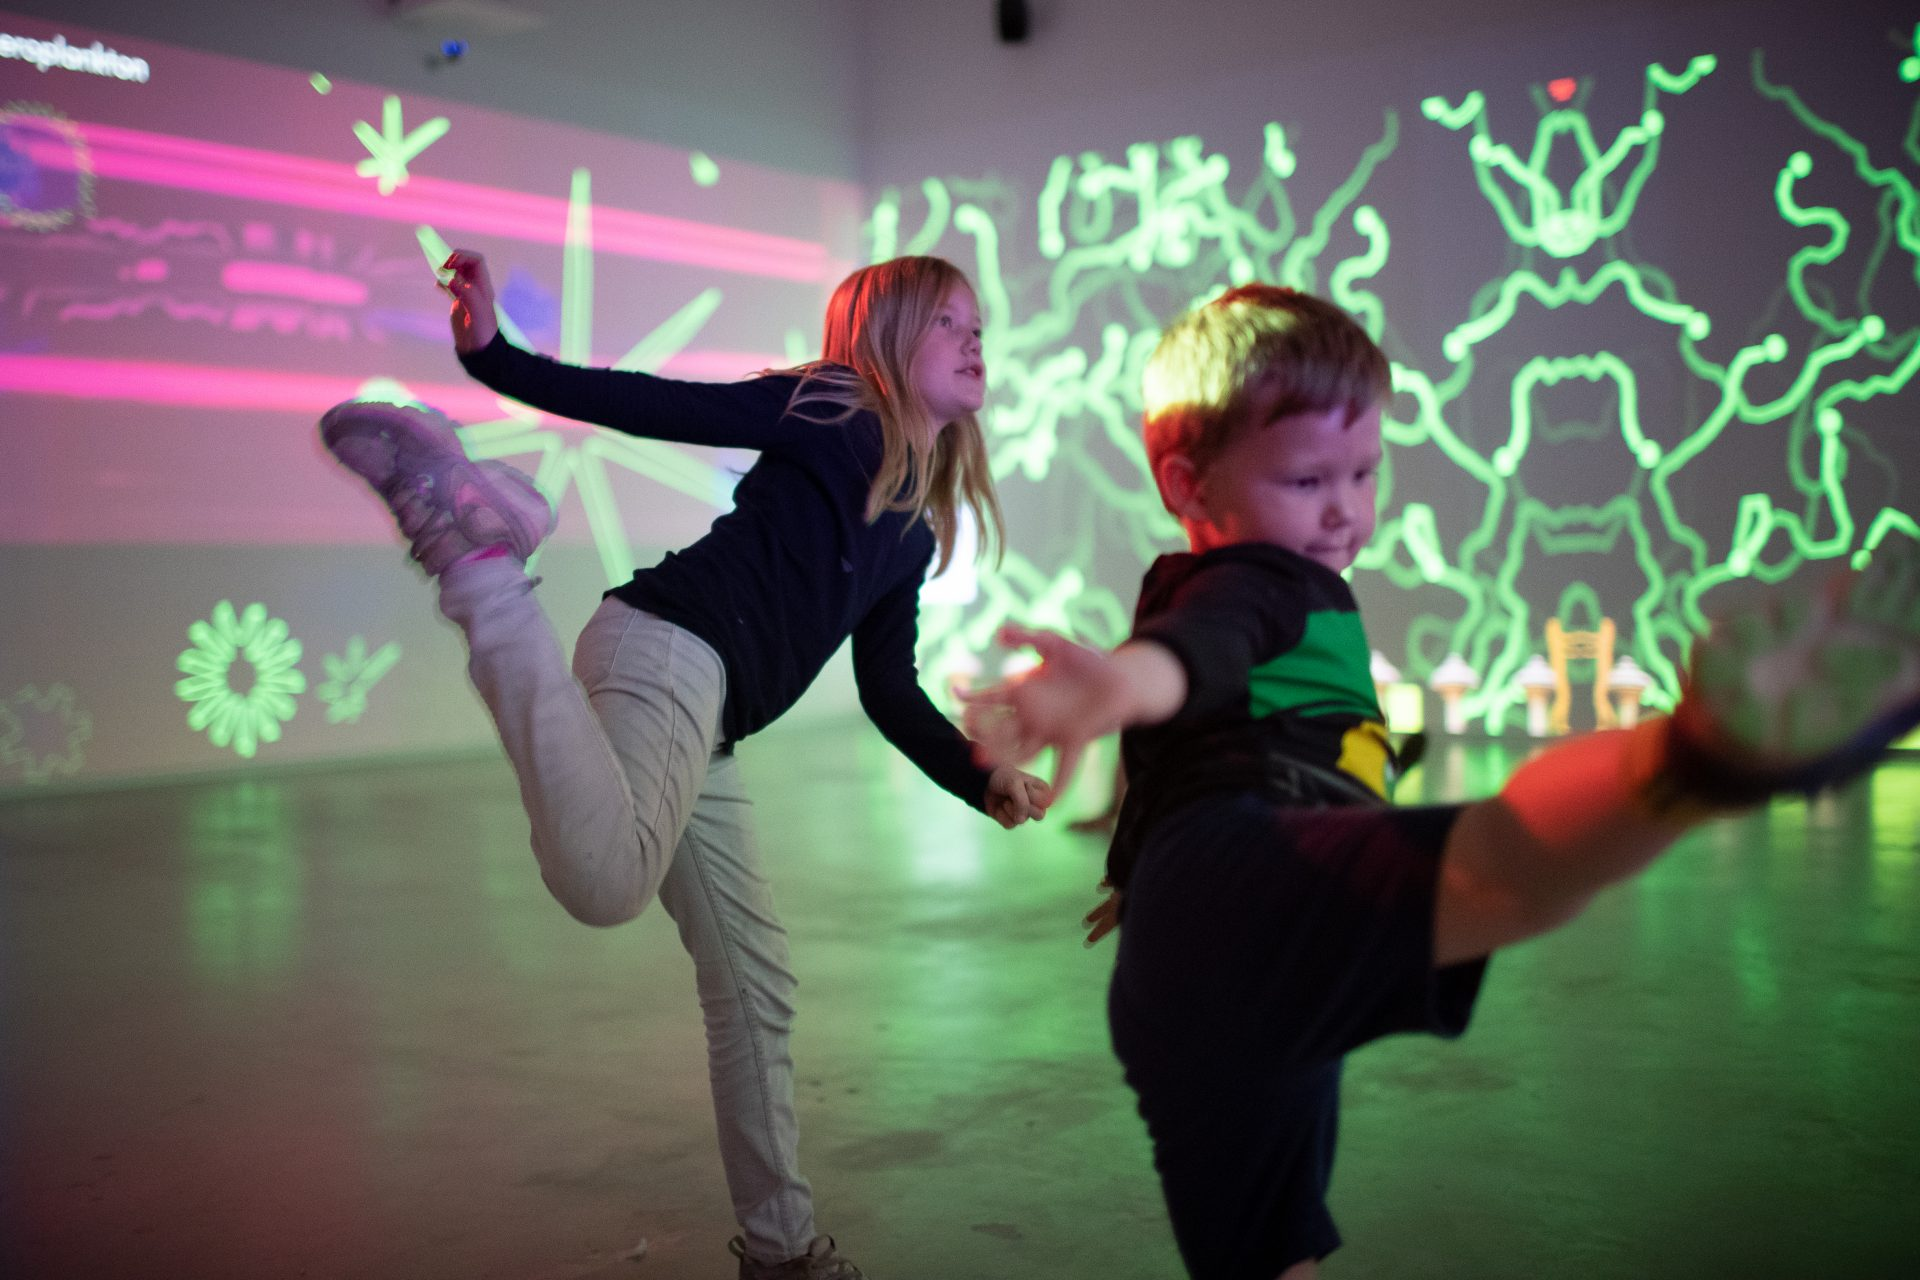 Microworld Kristiansand Sørlandets Kunstmuseum interaktiv familieutstilling. Kvalitetstid med familien! Ferietips for Norgesferie.